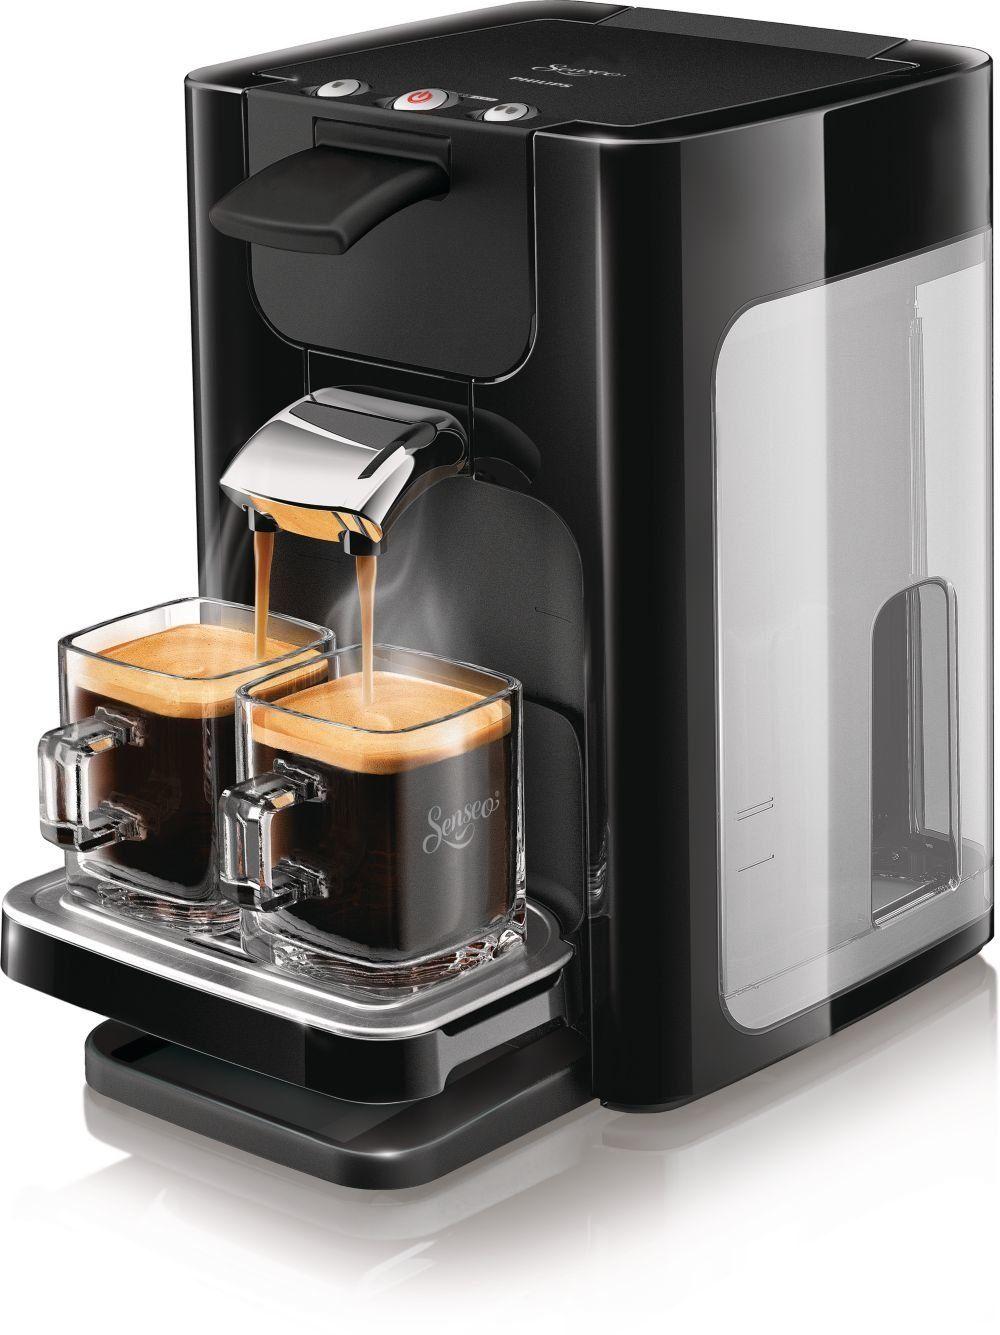 Philips Senseo Quadrante HD7863 coffee machine black